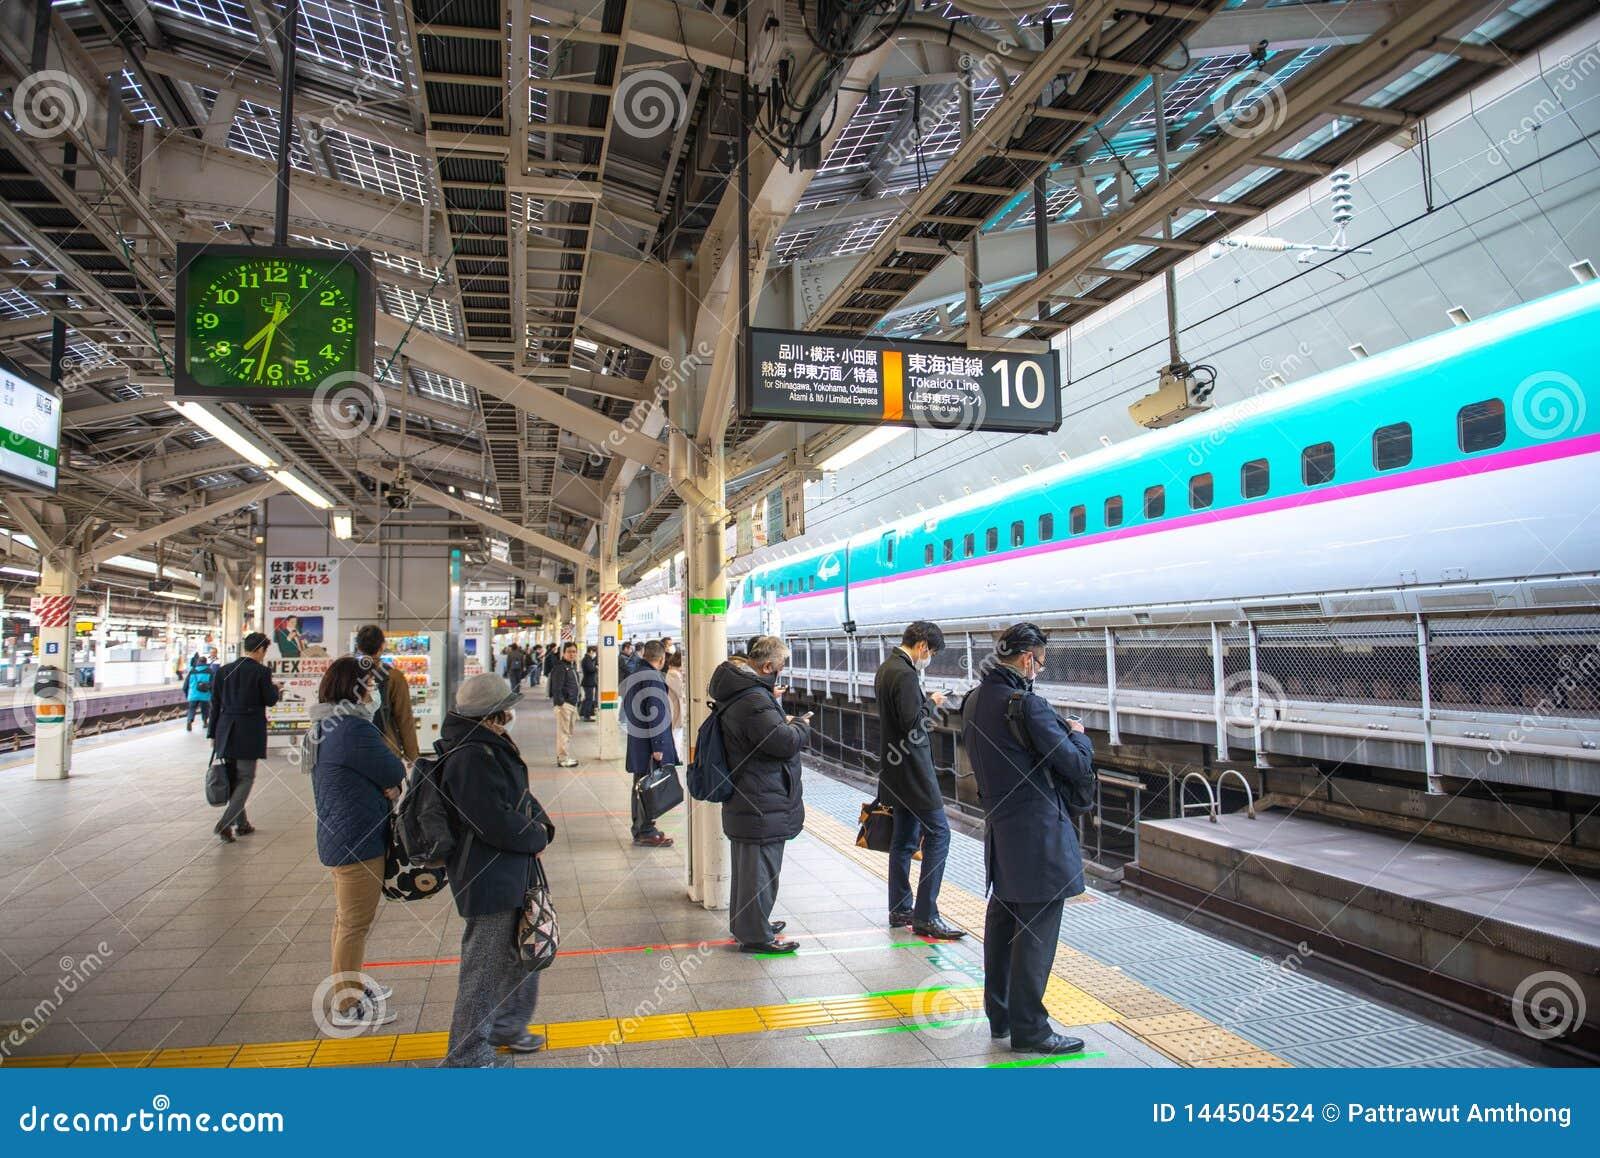 People waiting for Shinkansen bullet train